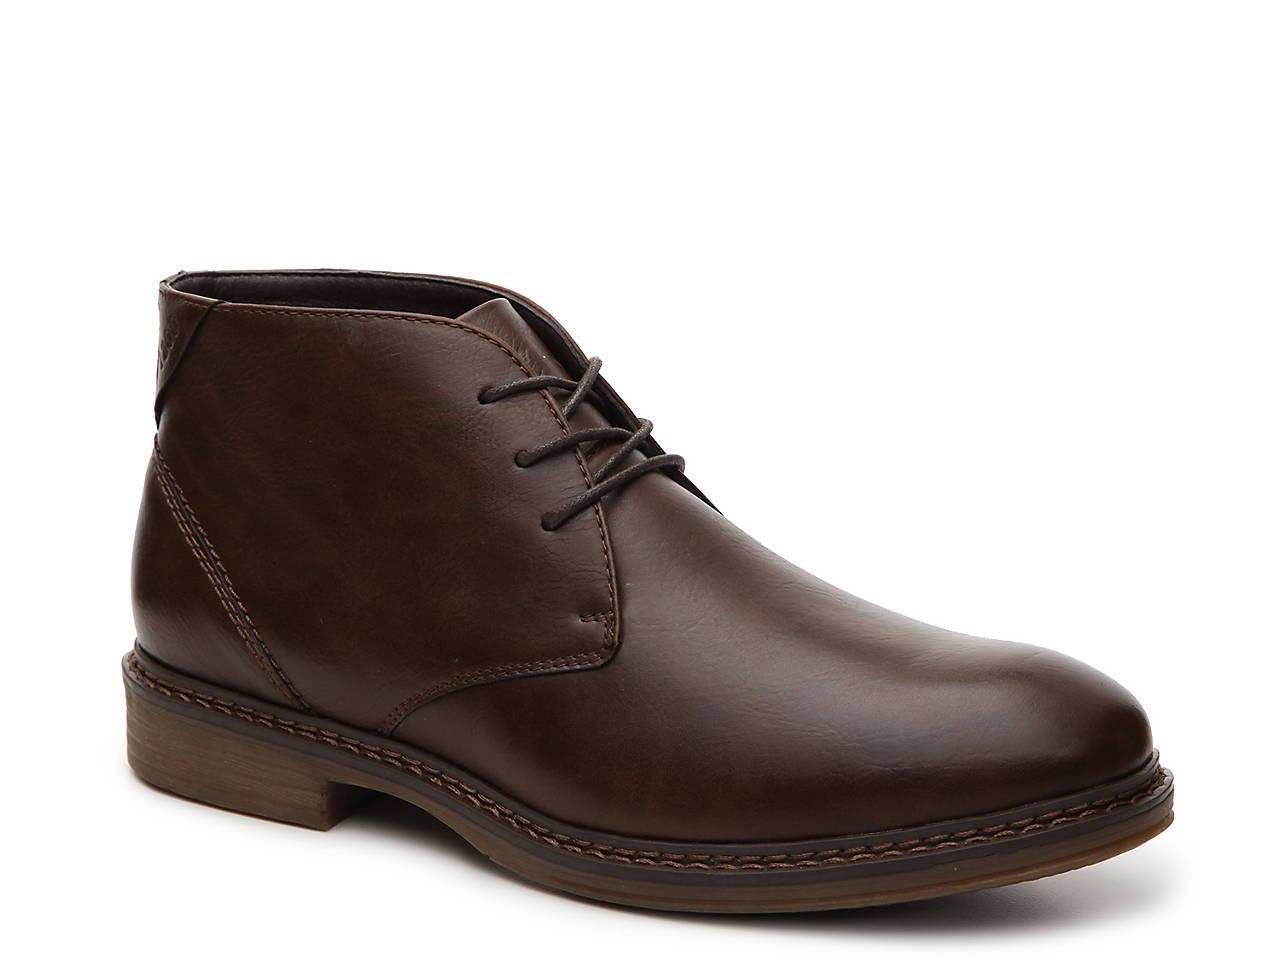 Men's Chukka Boots   DSW